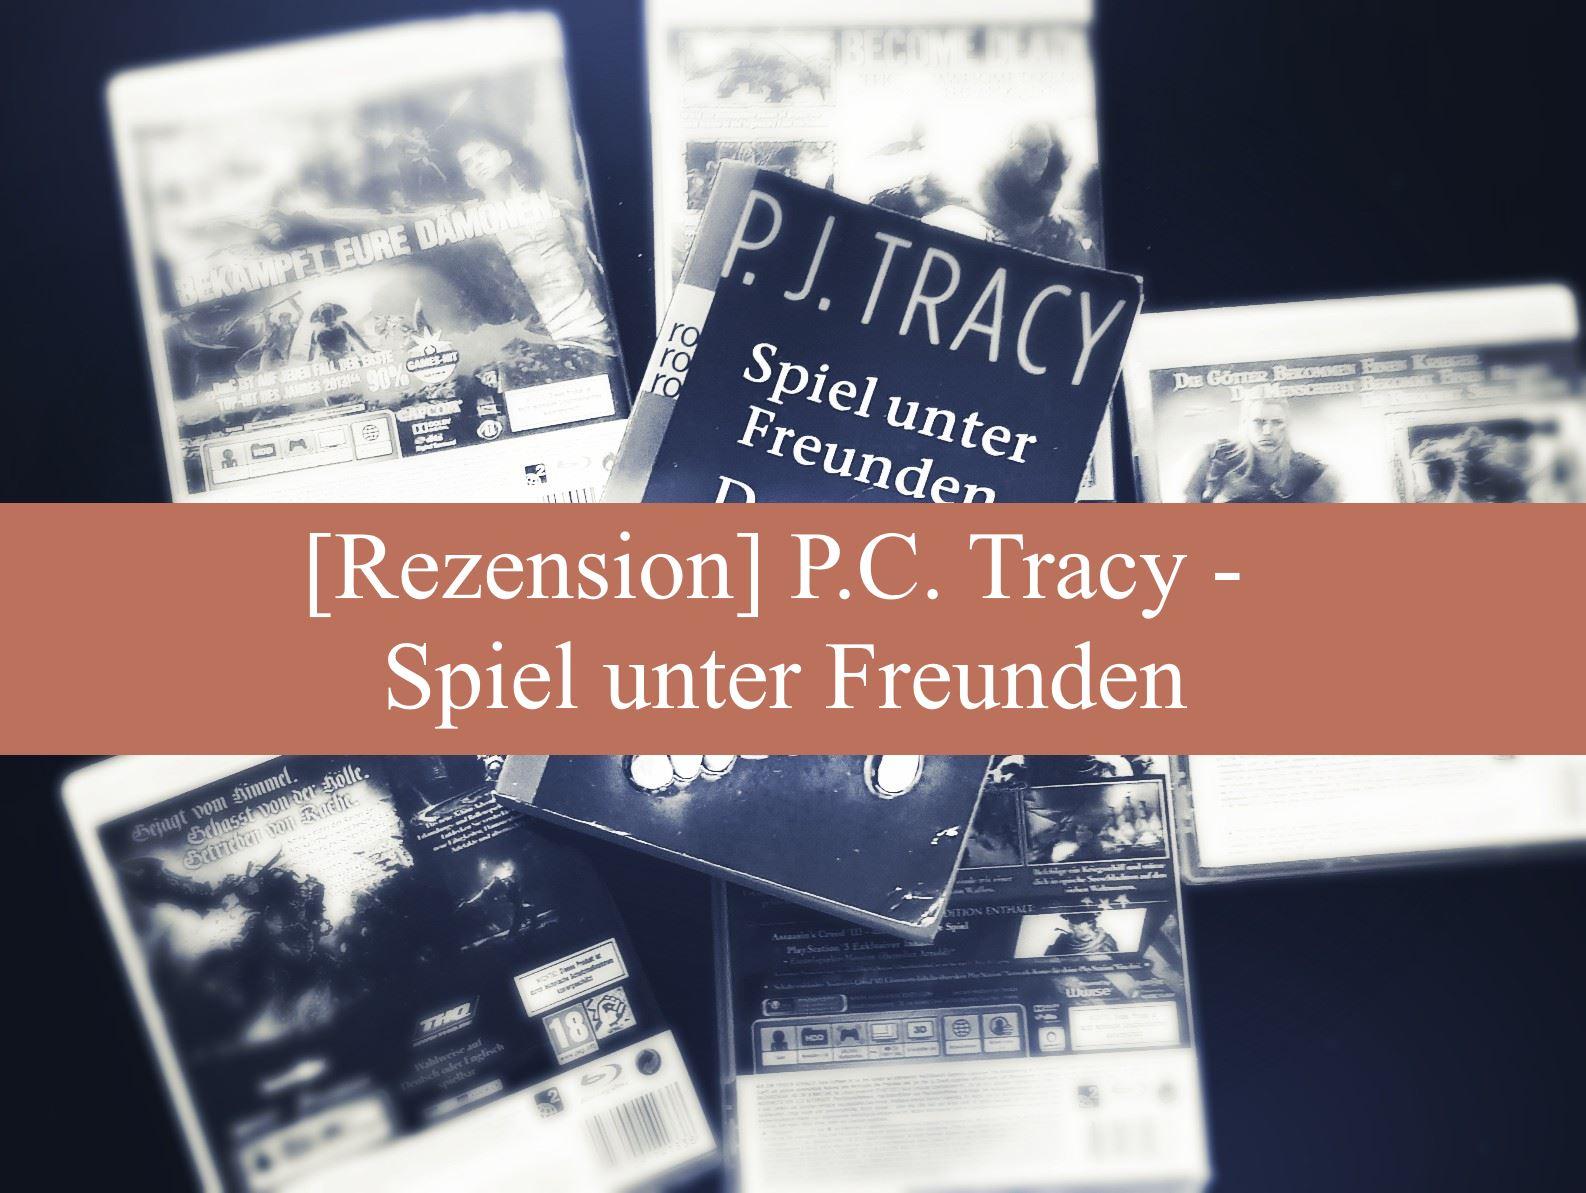 [Rezension] P.C. Tracy – Spiel unter Freunden